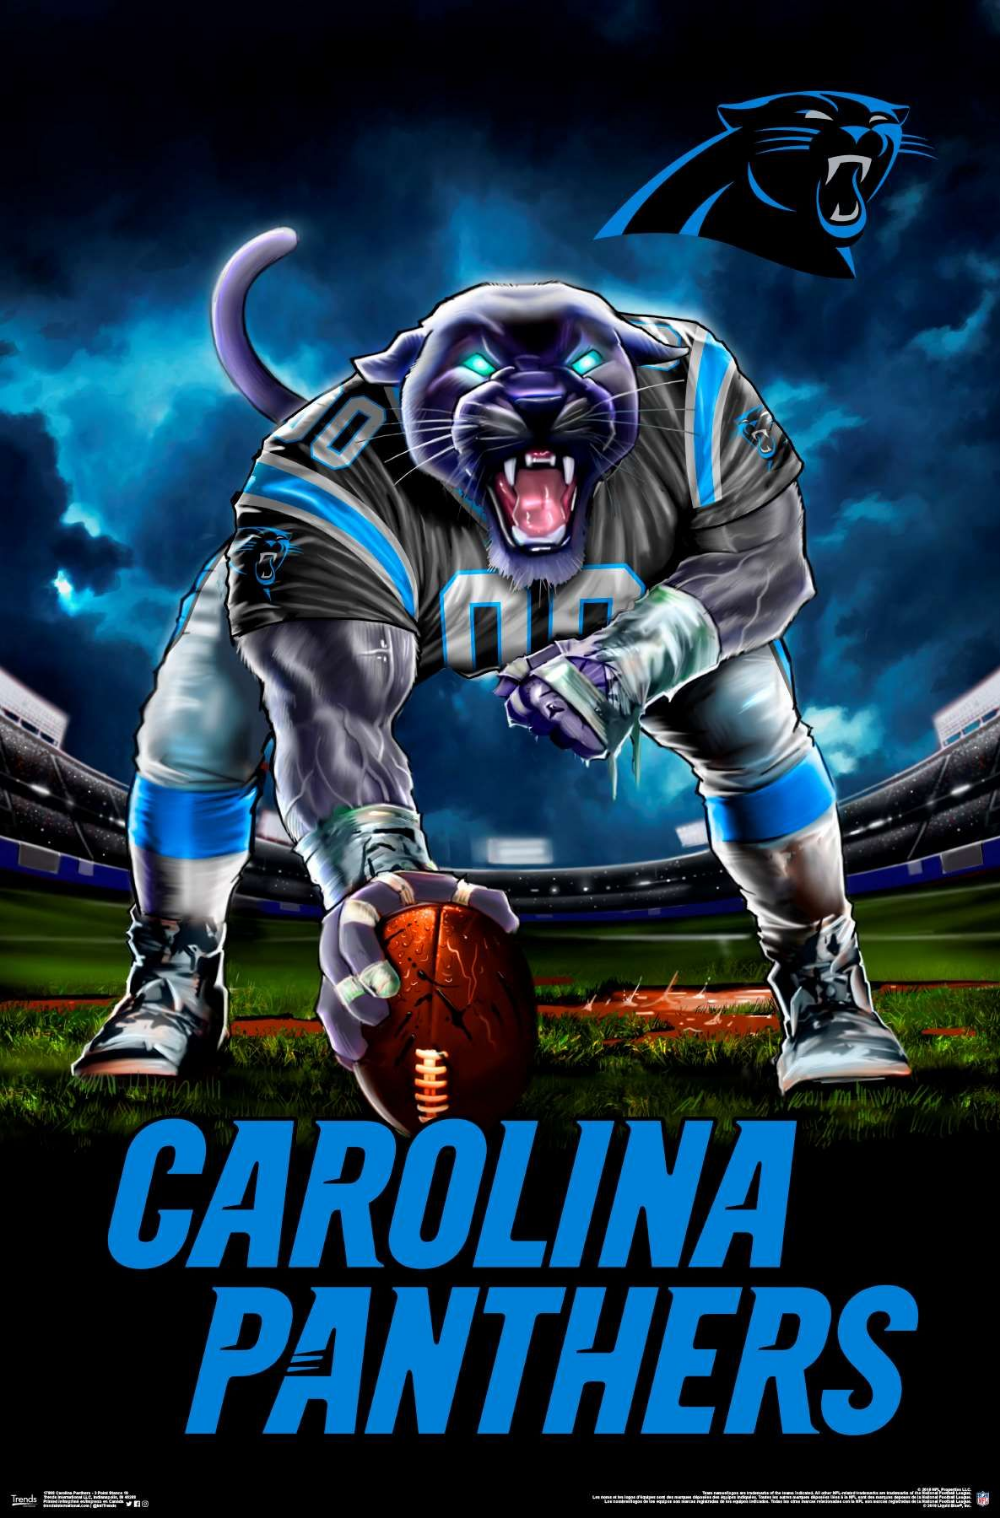 Nfl Carolina Panthers 3 Point Stance 19 Carolina Panthers Football Nfl Carolina Panthers Nfl Football Pictures